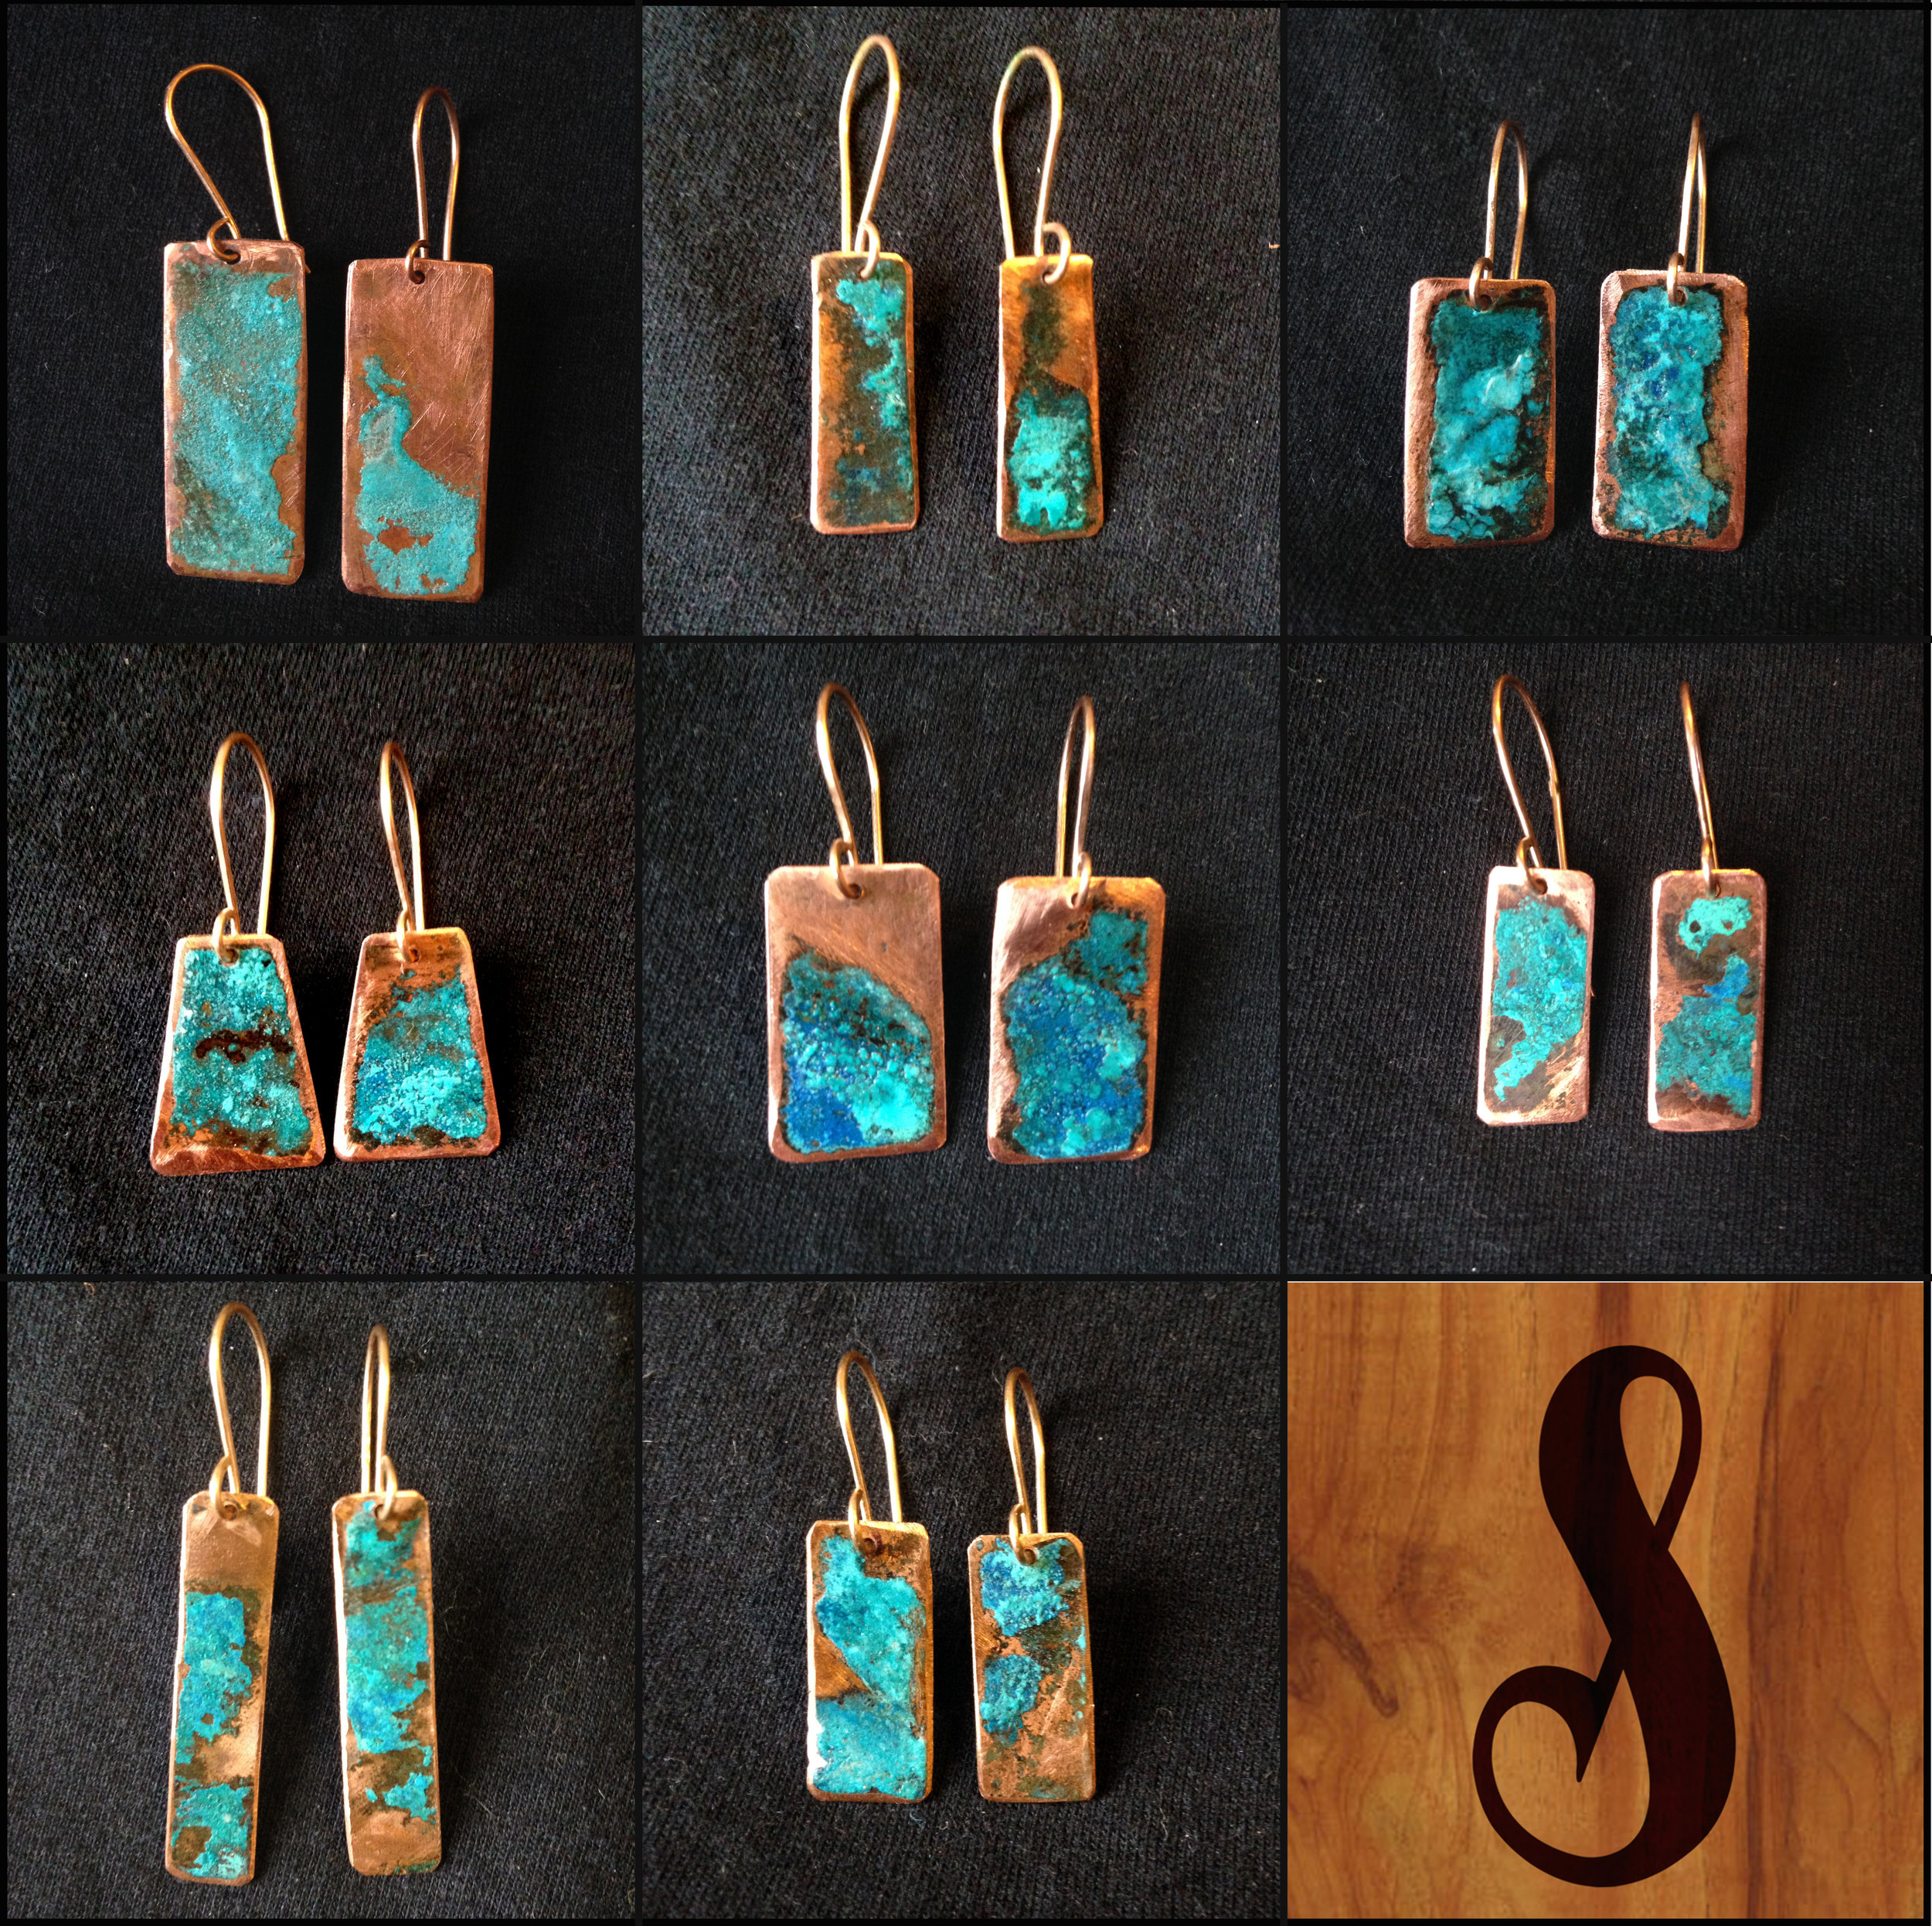 copper patina collage sml.jpg